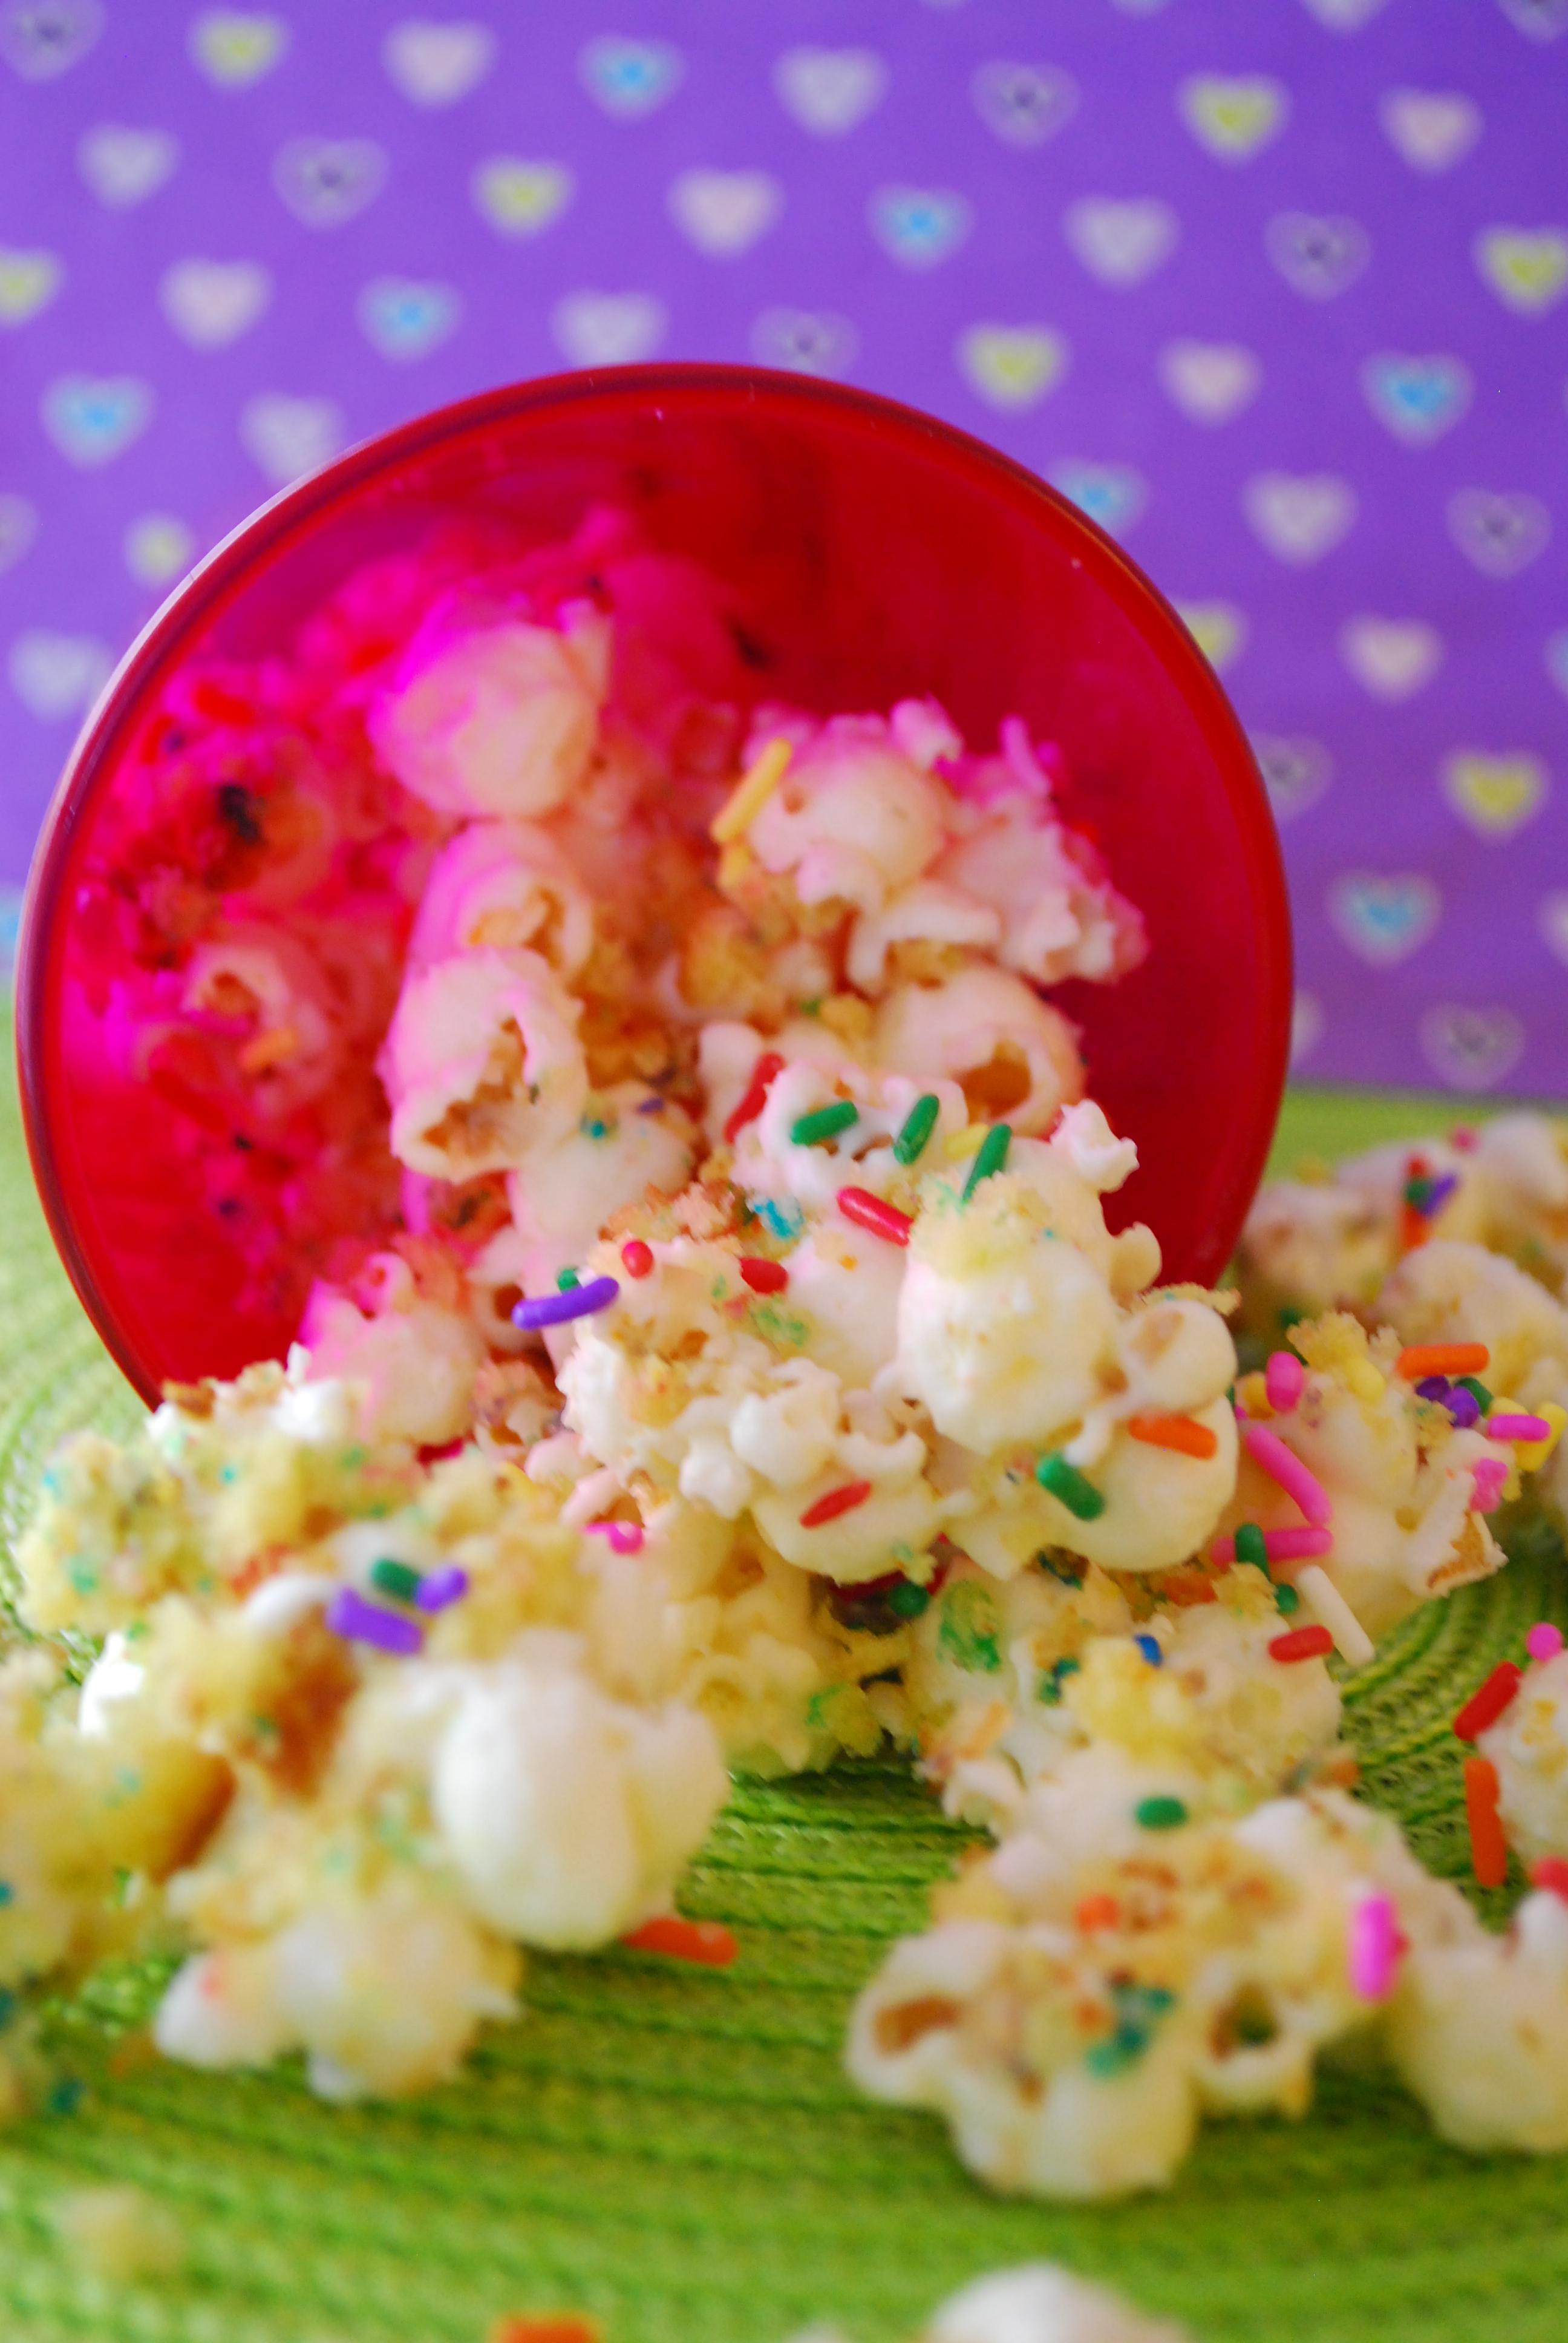 Birthday Cake Popcorn Inspired By Shellys Red Velvet Recipe Link Above